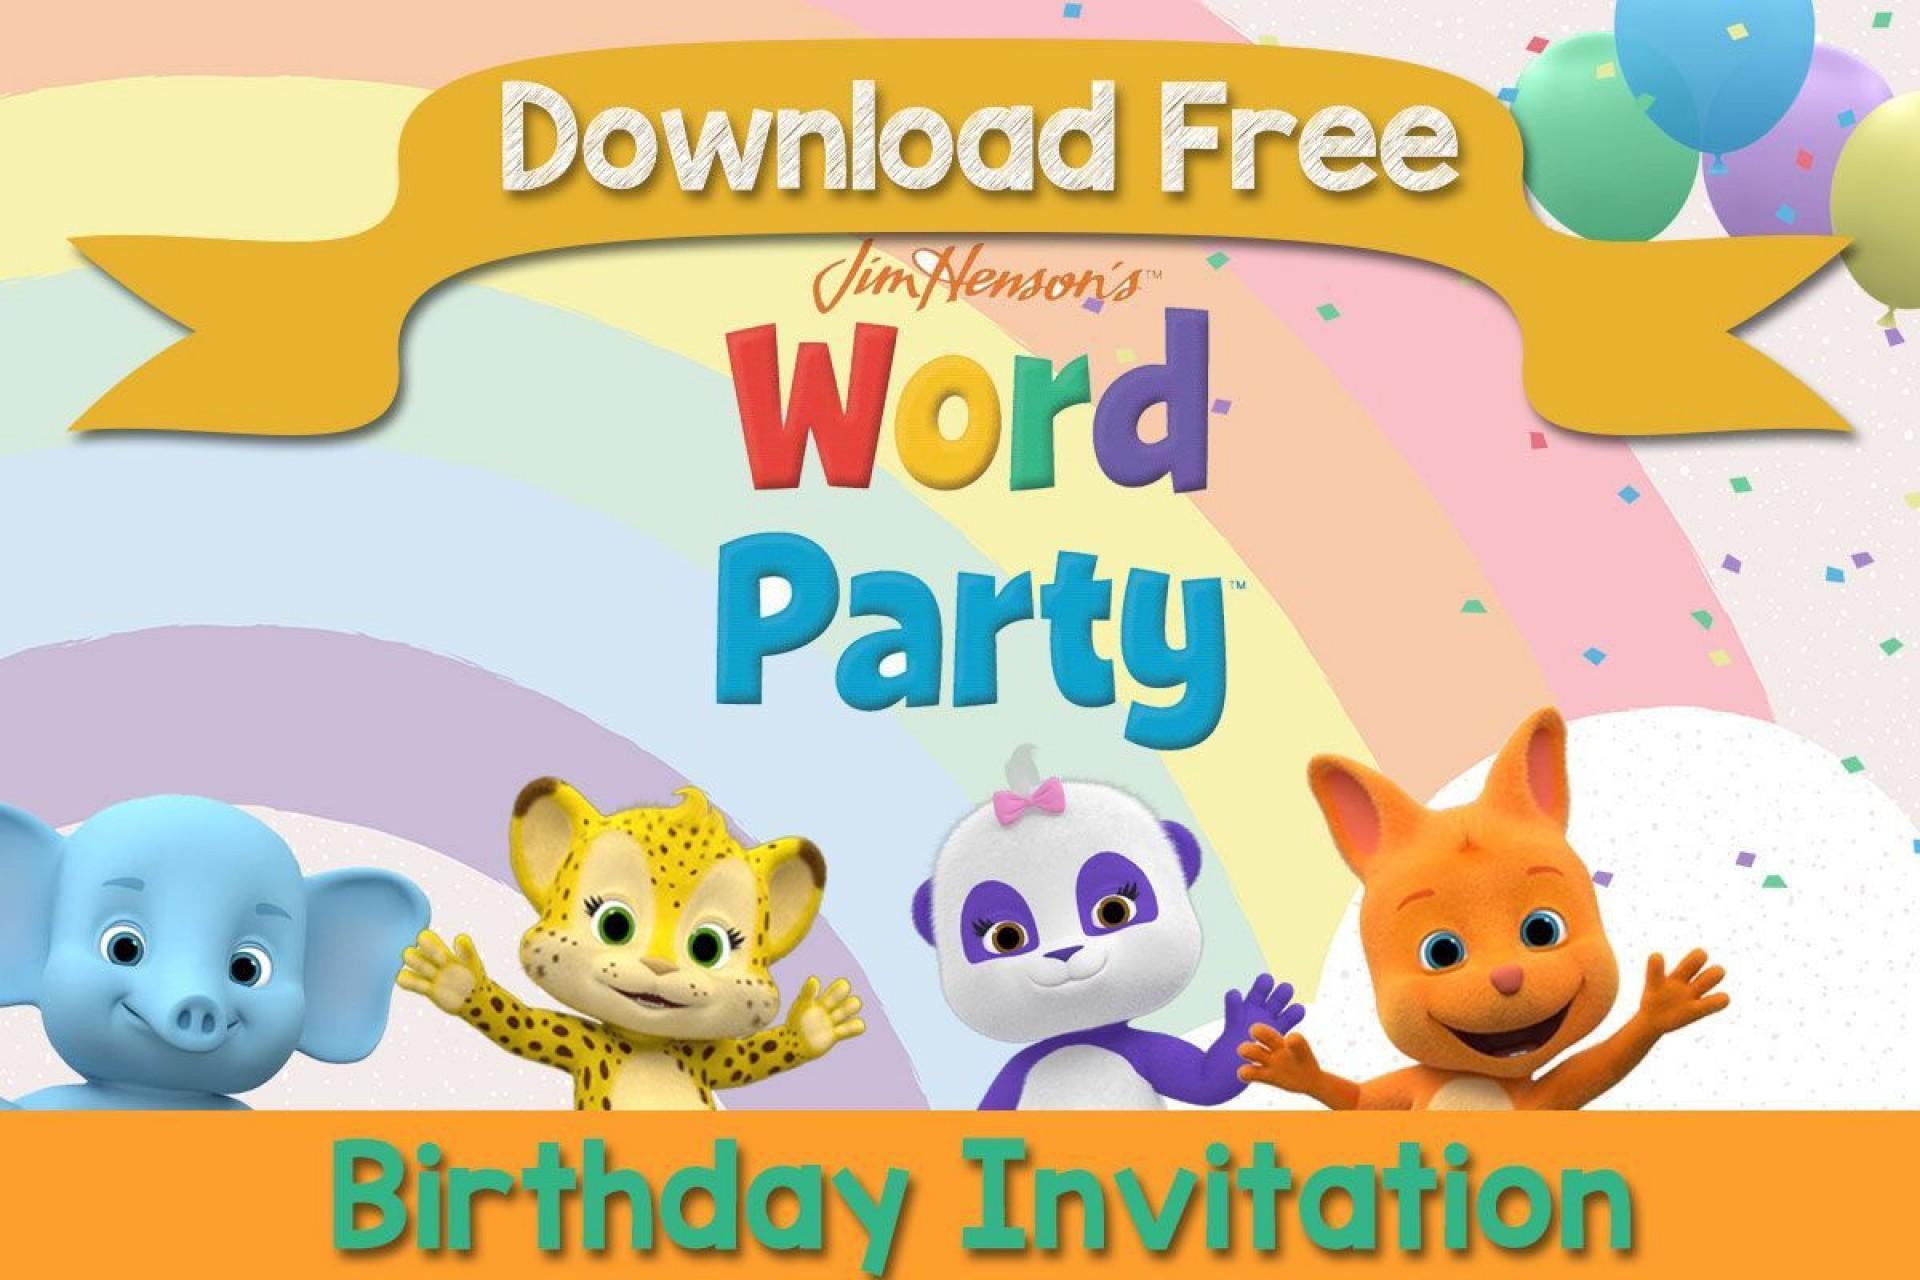 005 Singular Birthday Invite Template Word Free Photo  Party Invitation1920